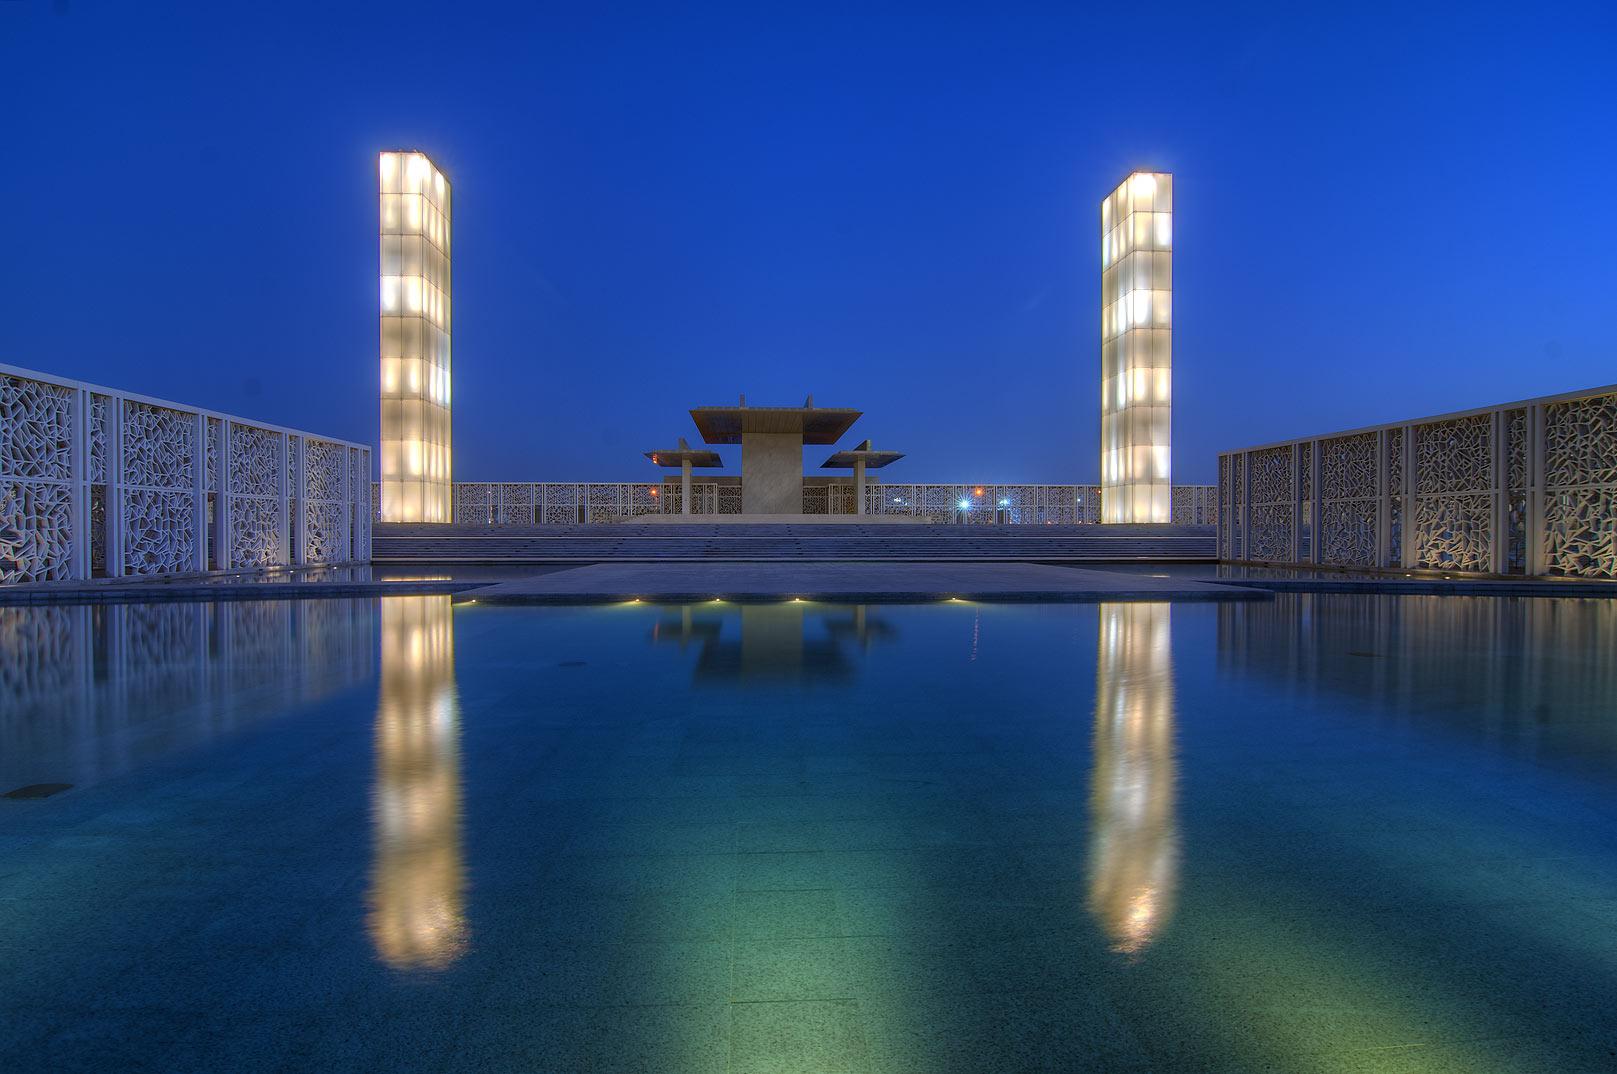 biao qatar foundation education city address